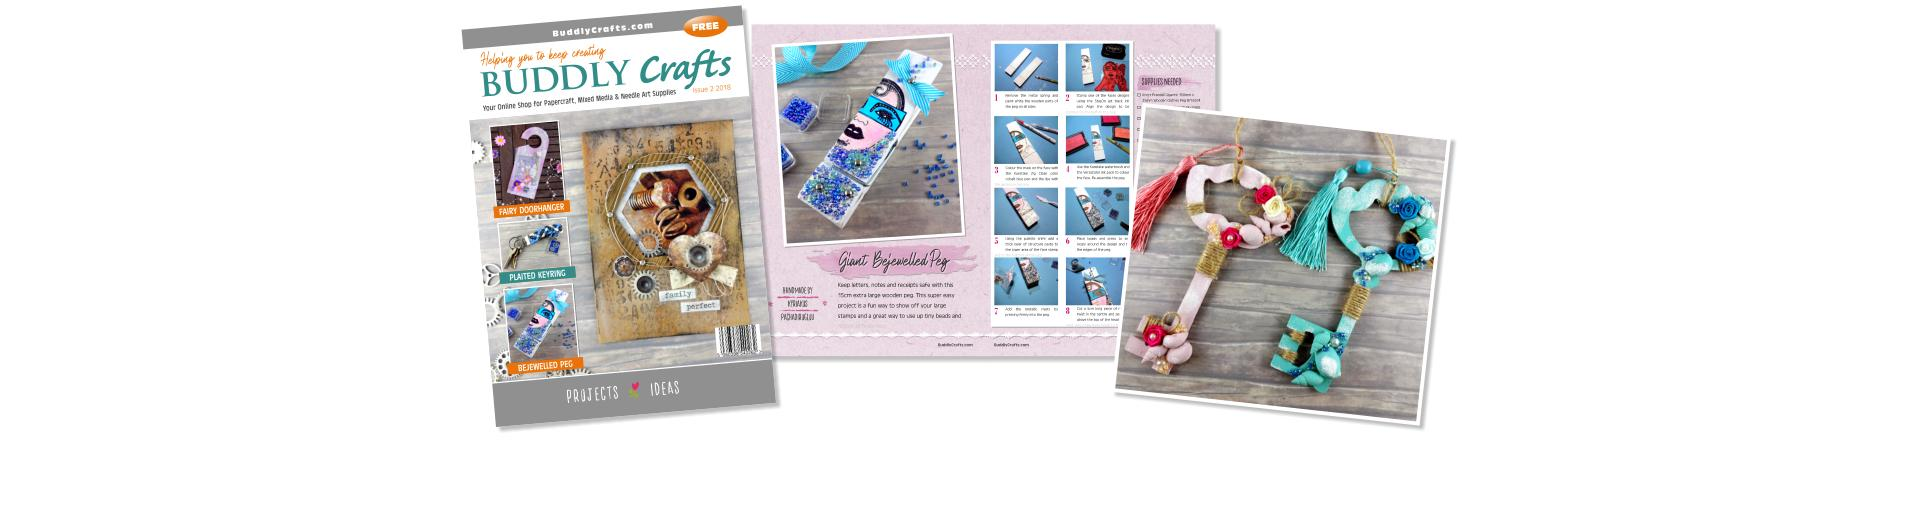 Papercraft, Mixed Media & Needle Art Supplies